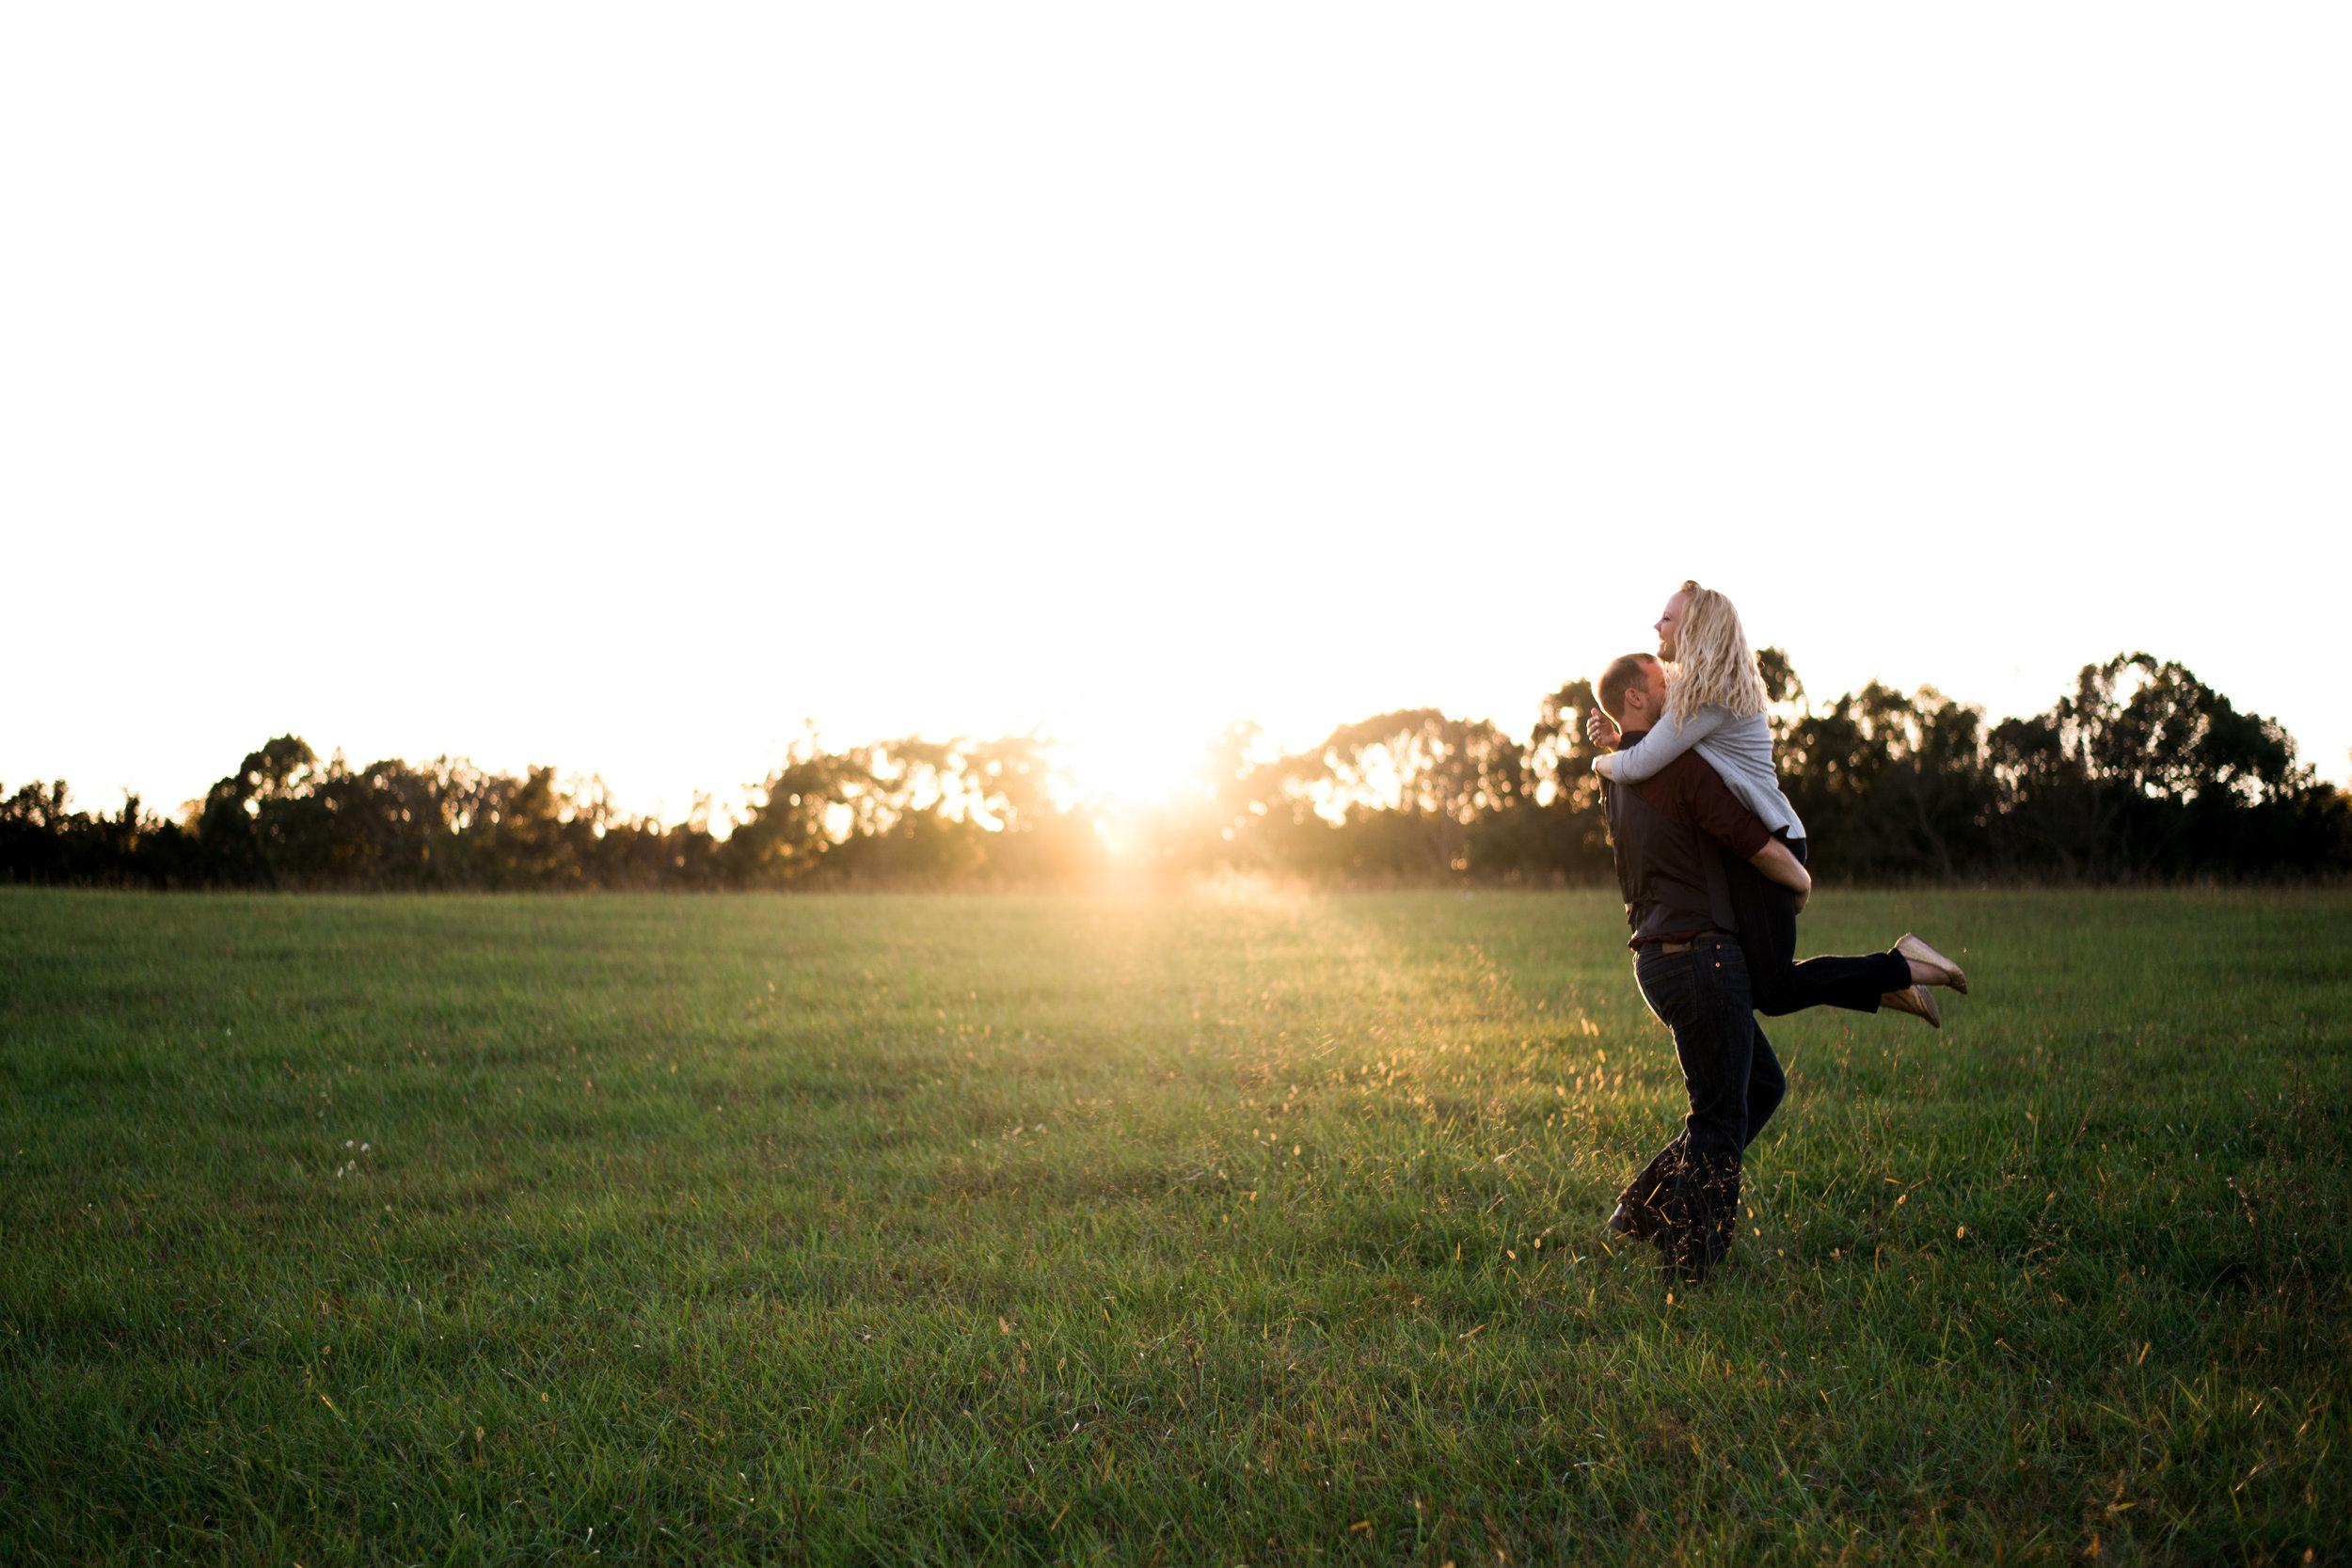 Lynchburg_College_Sorella_Farms_Baseball_Ballet_Virginia_Engagement_Session_Wedding_Photographers (77).jpg